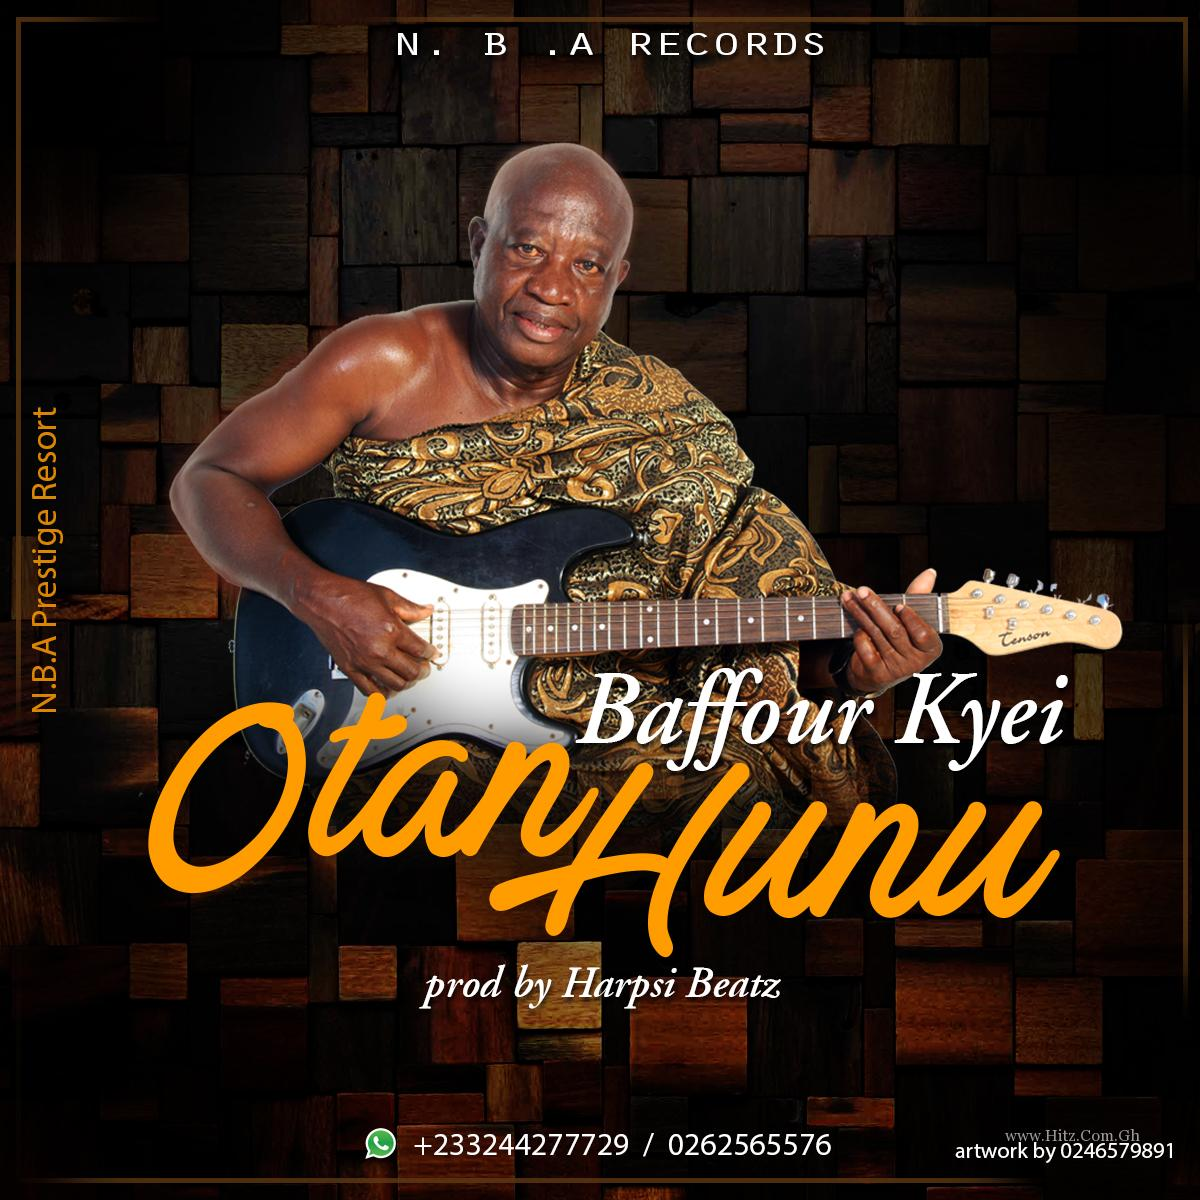 Mr.Baffour Kyei – Otan Hunu Ara (Prod.by HarPsi)